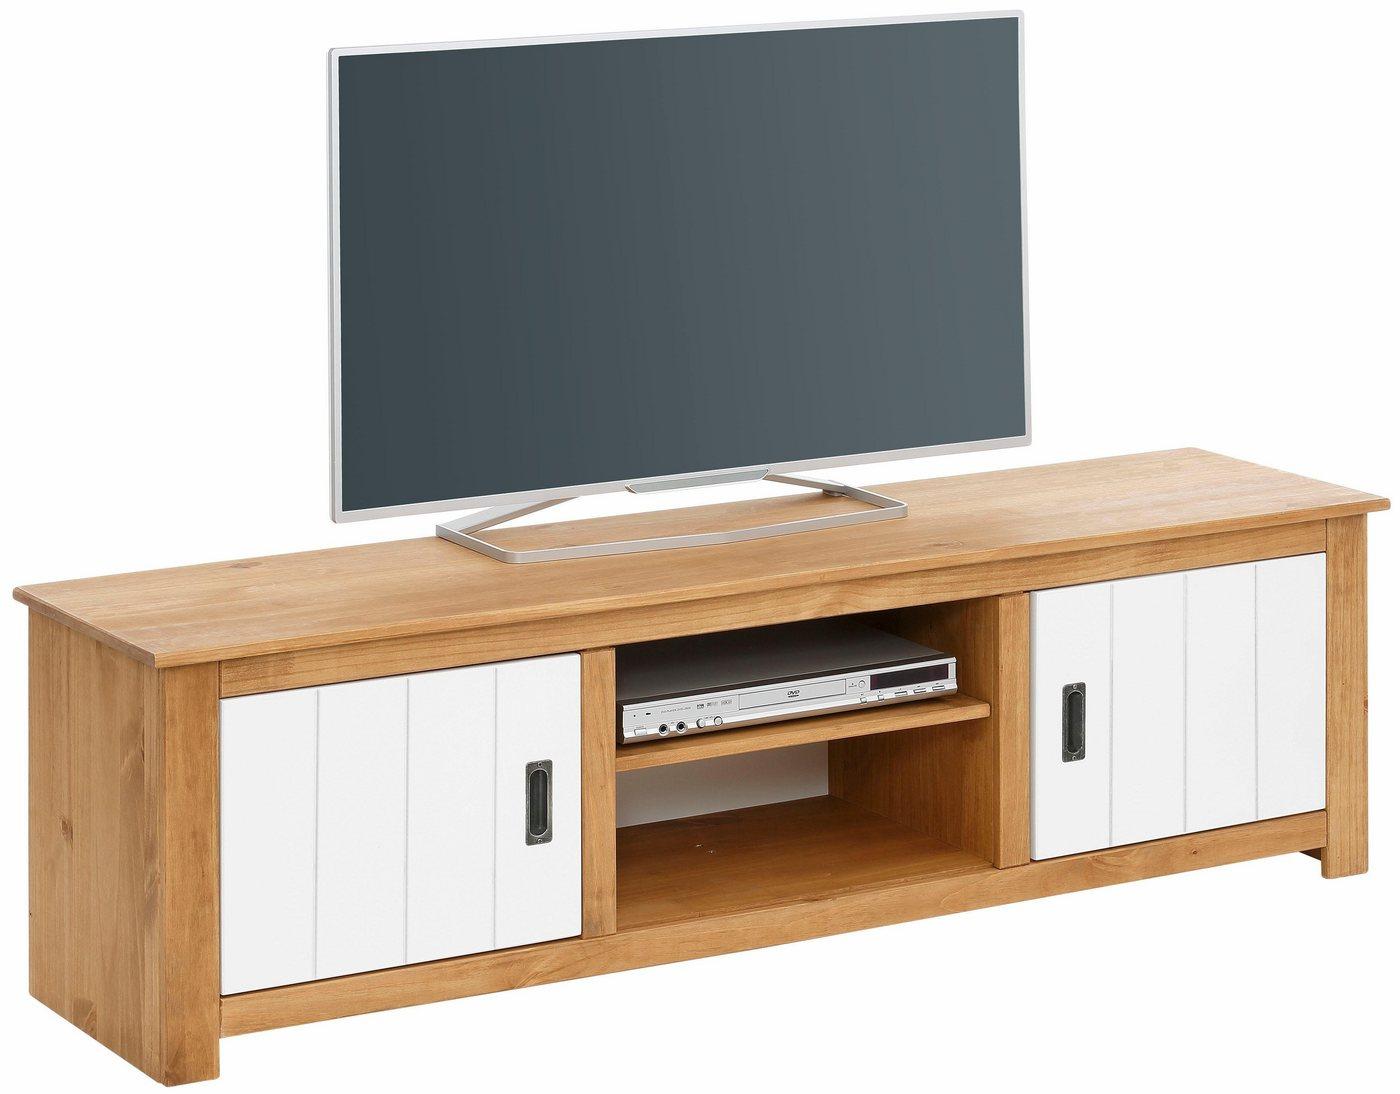 HOME AFFAIRE TV-meubel Kampen, breedte 158 cm